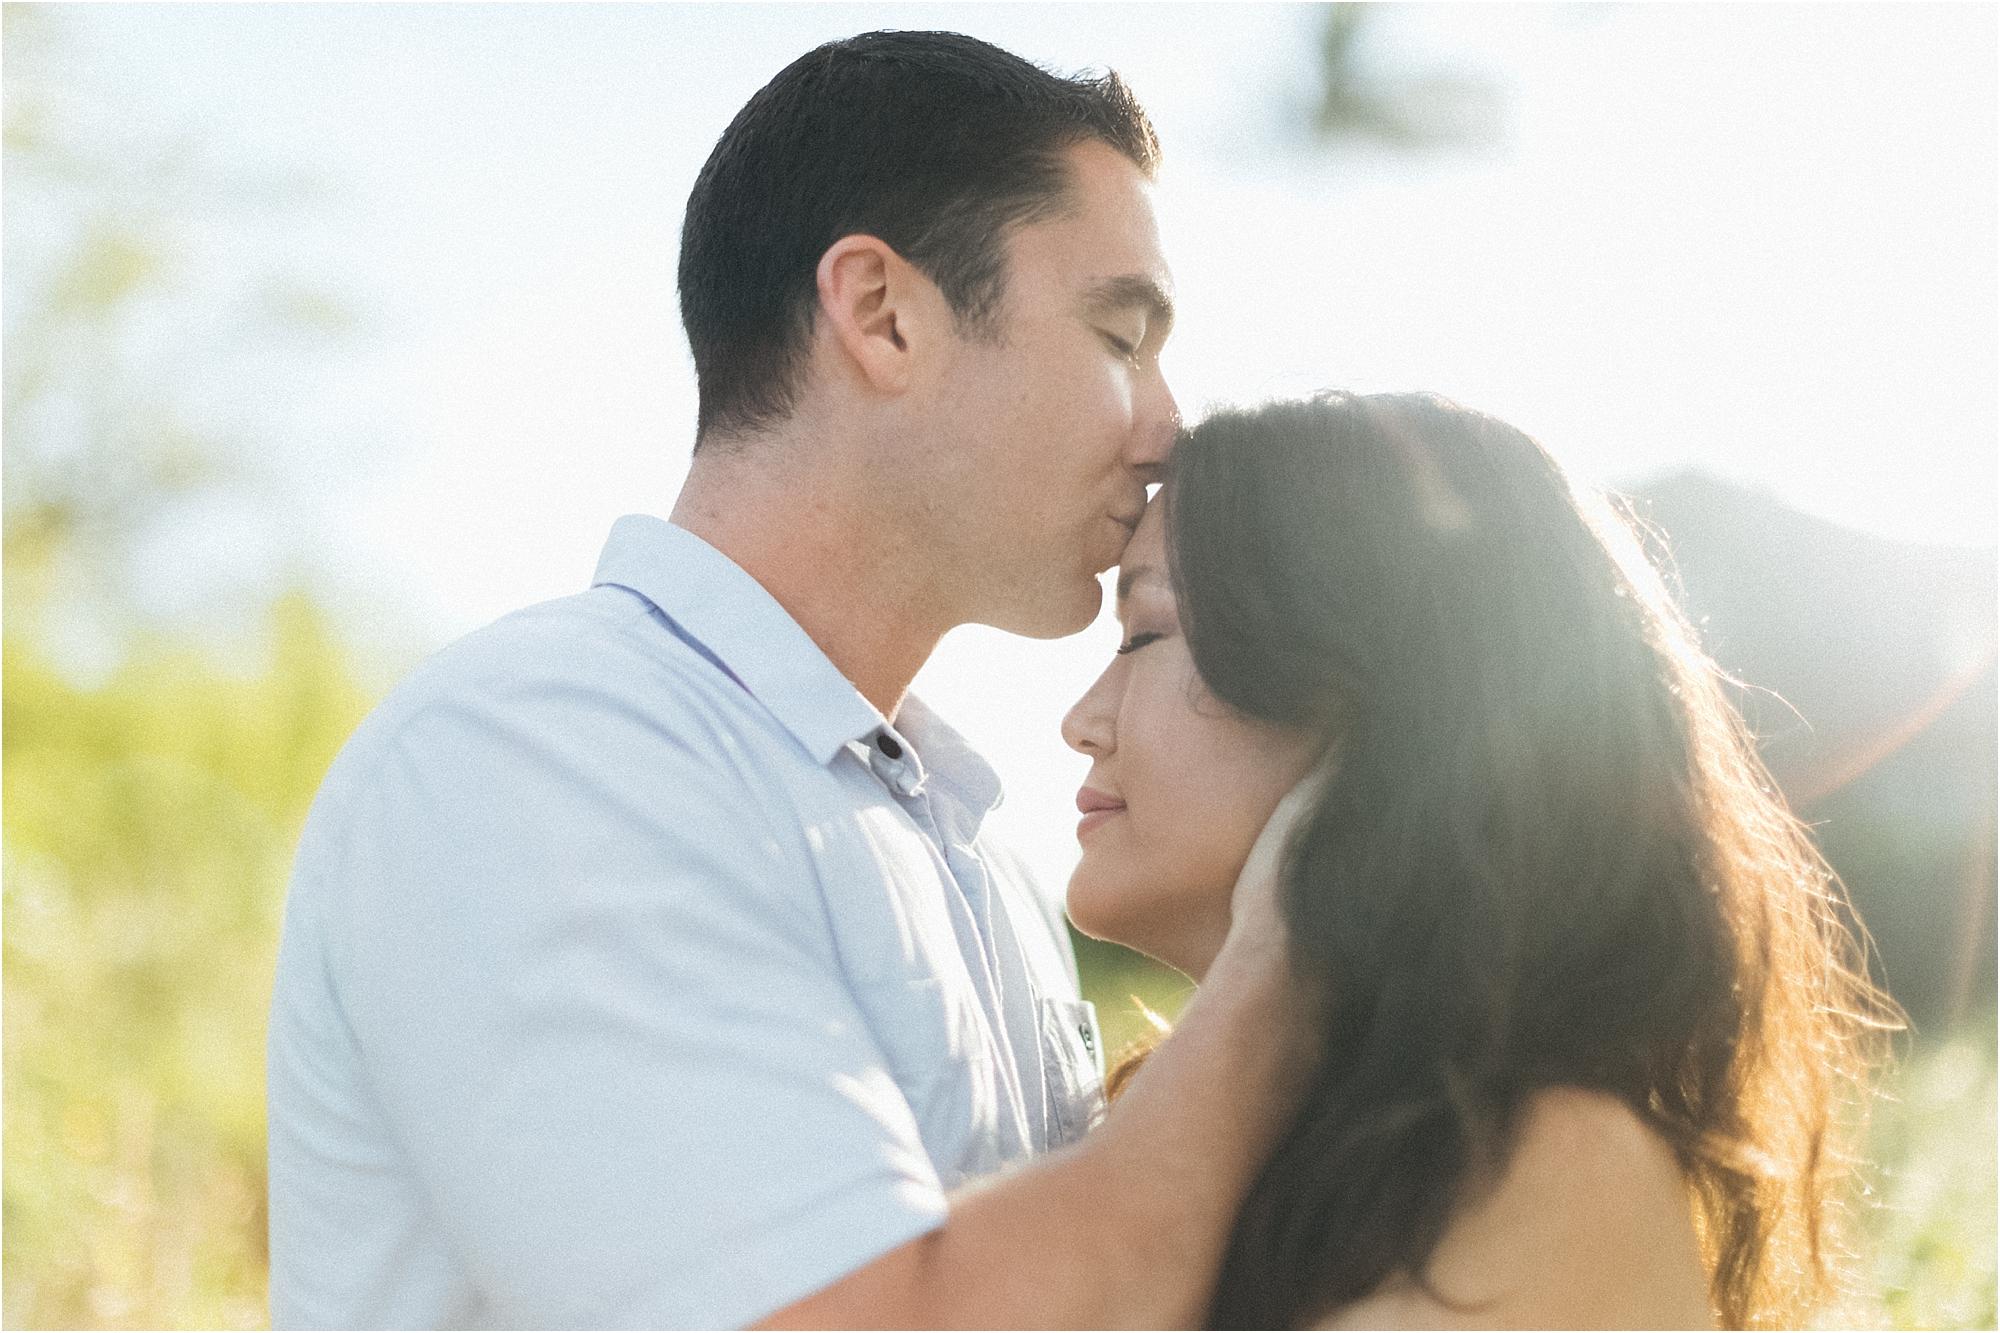 angie-diaz-photography-maui-hawaii-engagement-wedding-photographer_0013.jpg